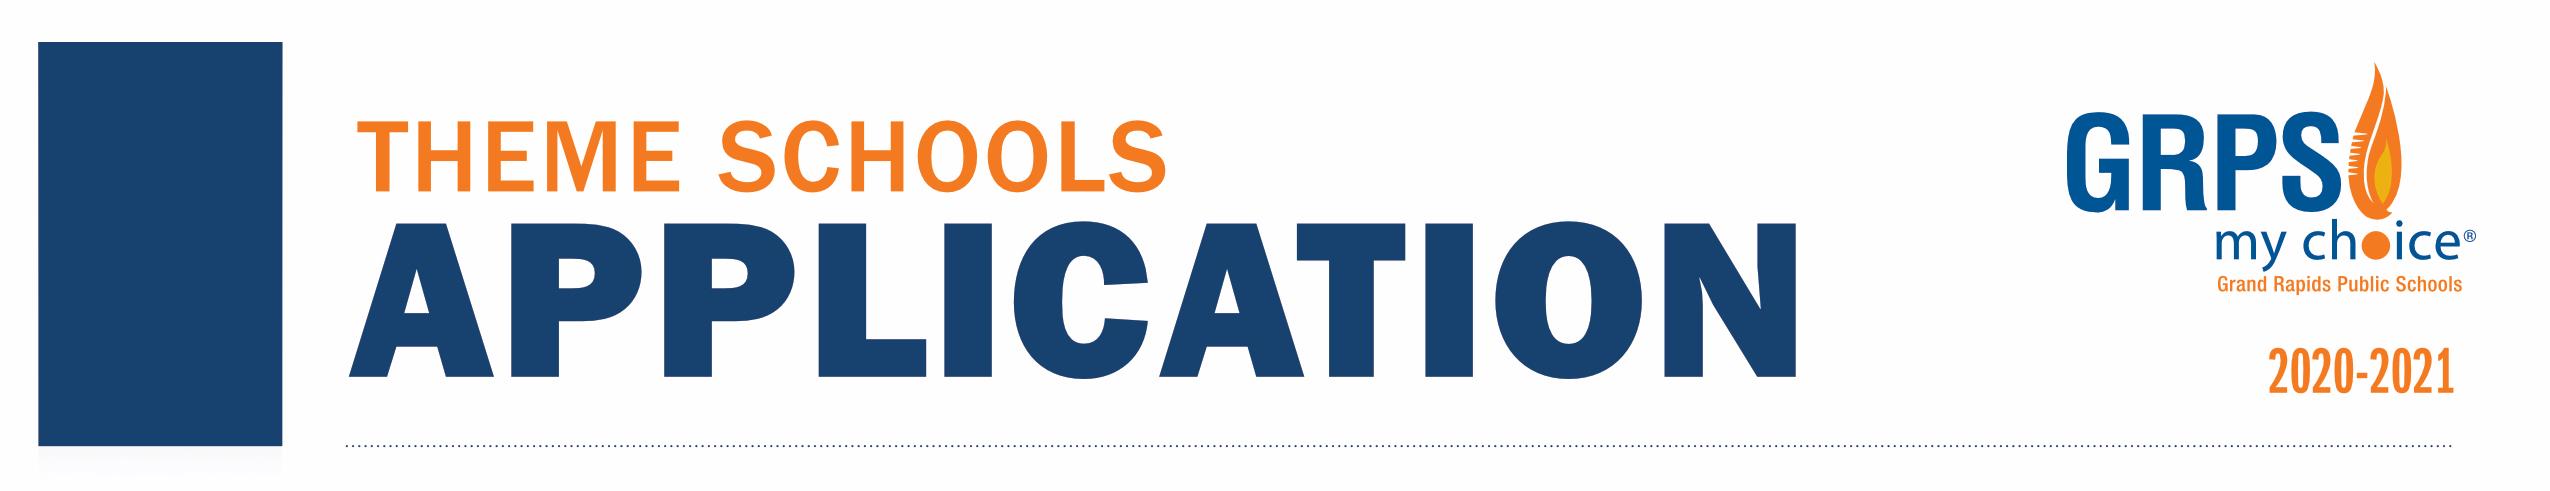 Applications & Enrollment Information Regarding Spring Break For Grand Rapids Public Schools